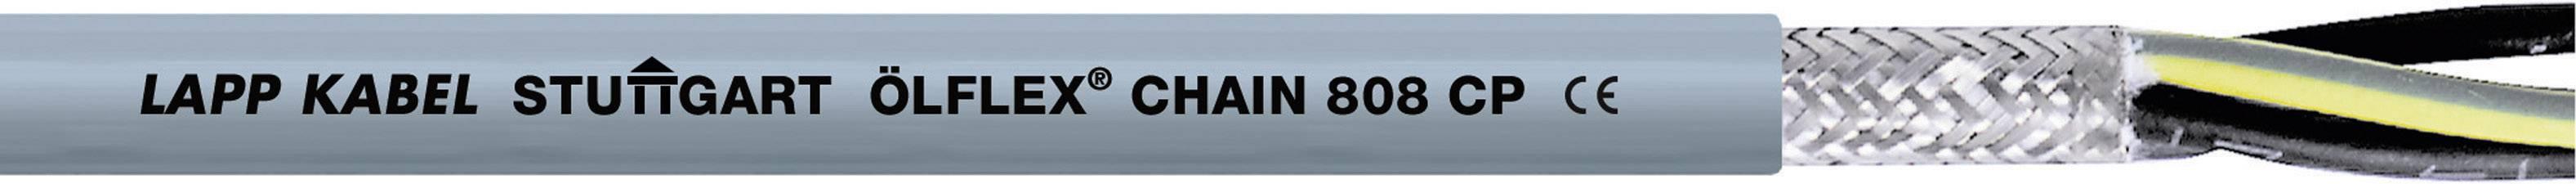 Žíla kabelu LappKabel ÖLFLEX CHAIN 808 CP 3G0,75 (1027760), 3x 0,75 mm², polyurethan, Ø 6,6 mm, stíněný, 100 m